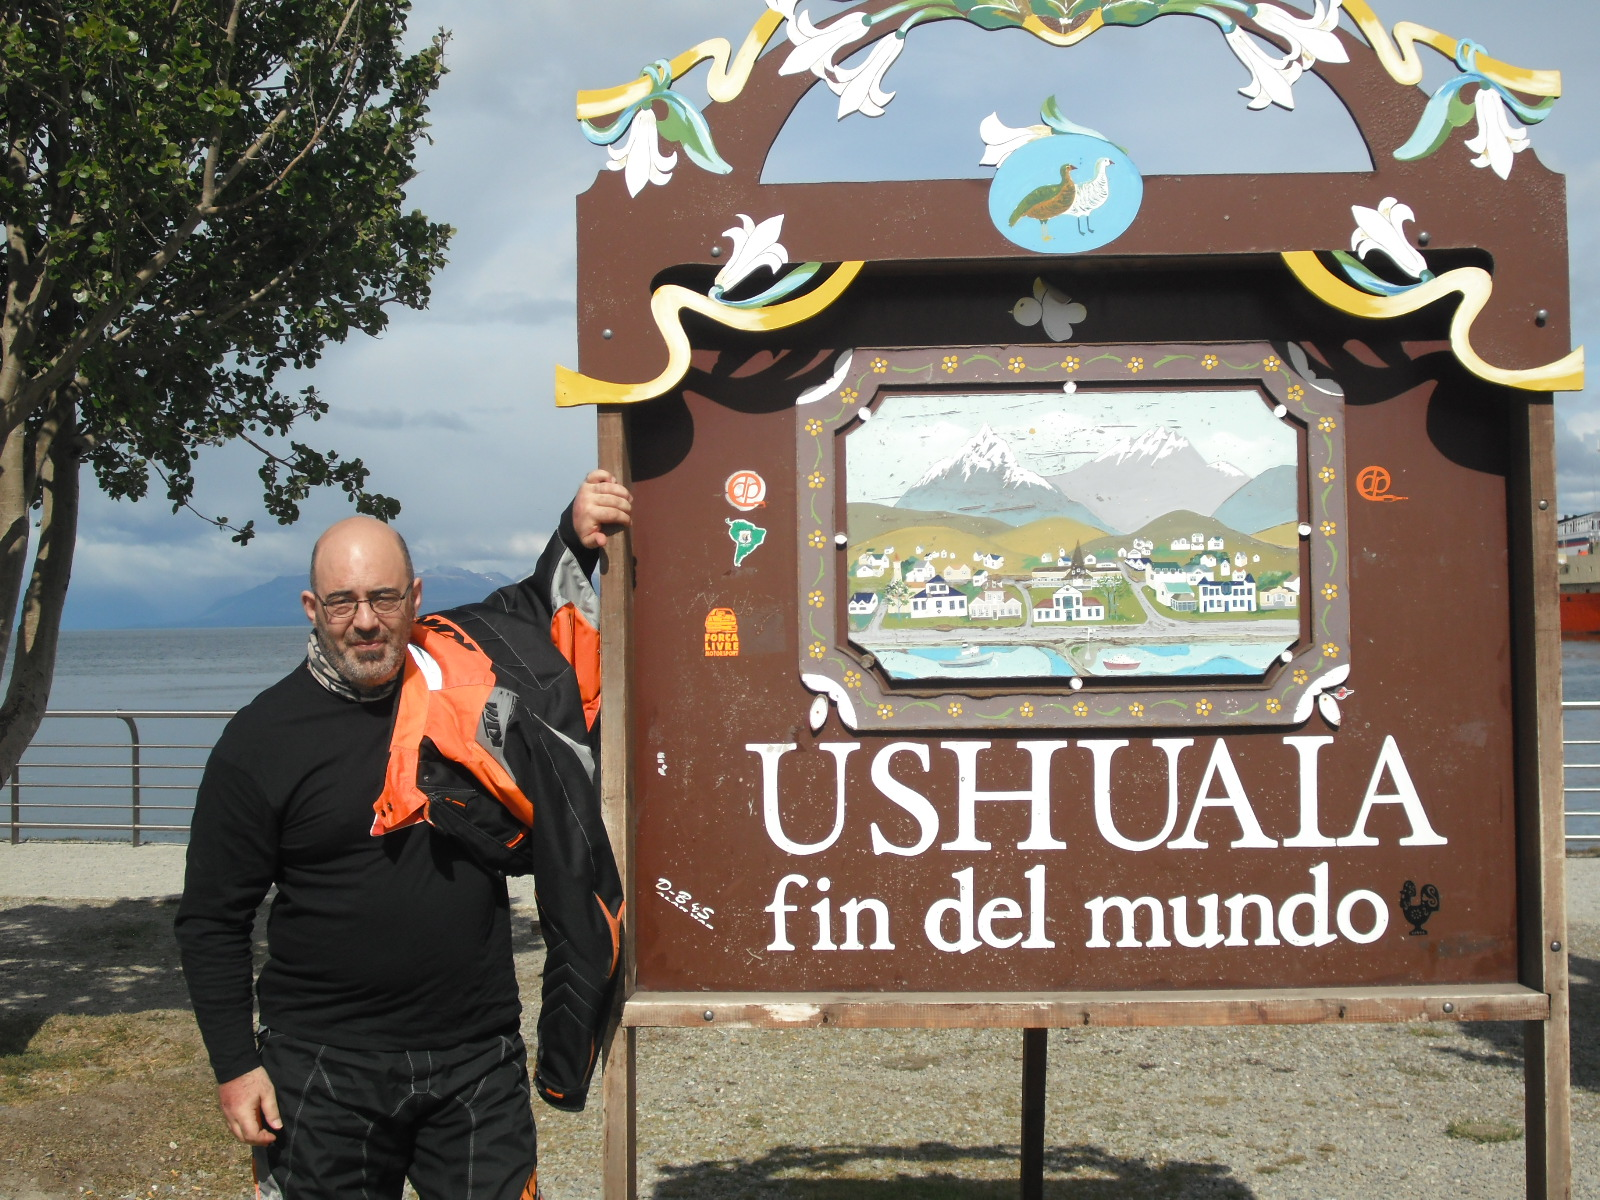 Mario Macrì - Ushuaia